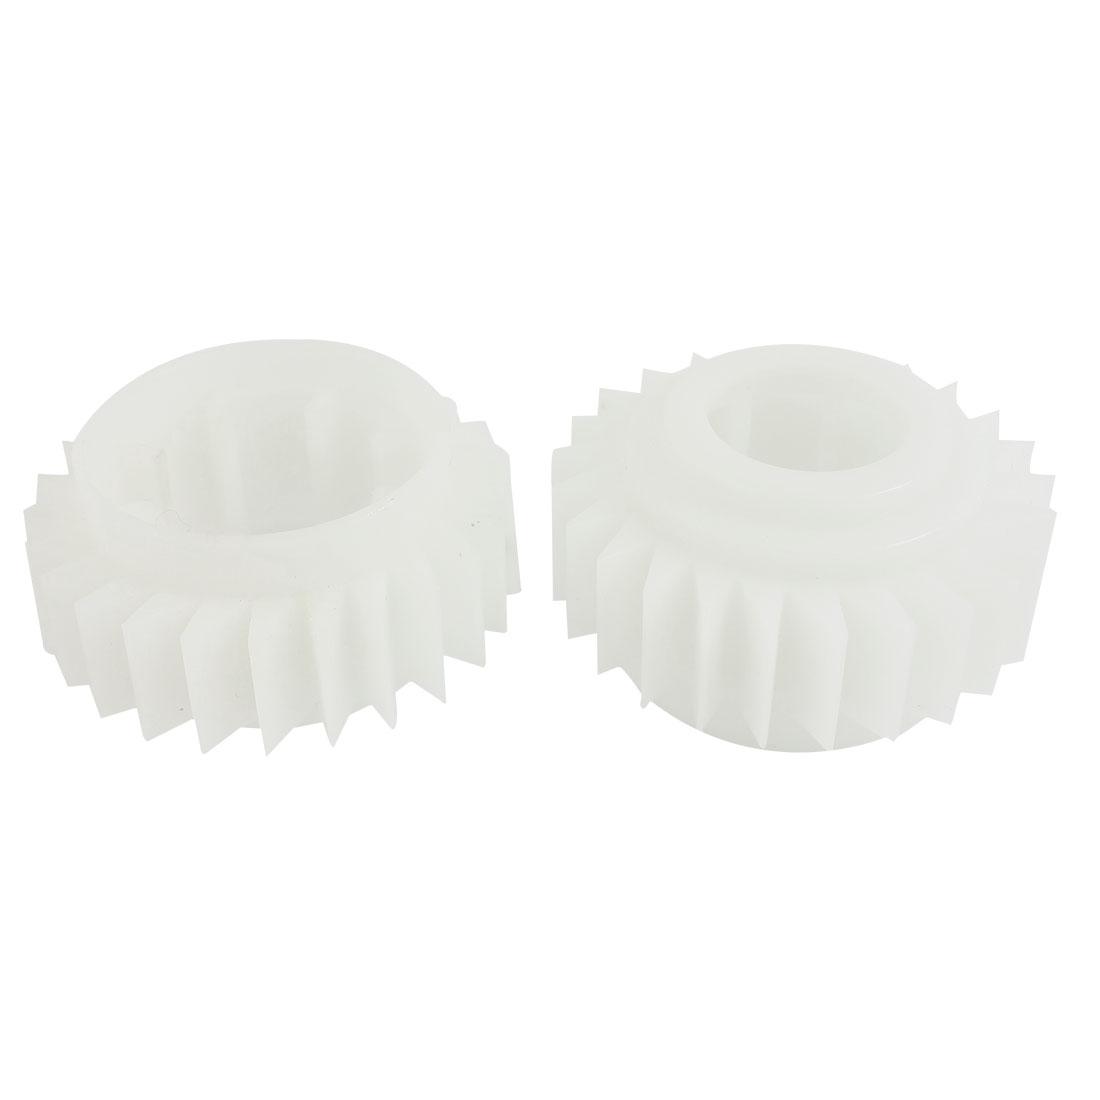 2PCS White Plastic 25 Teeth Clutch Ratchet Wheel for Sharp Washing Machine